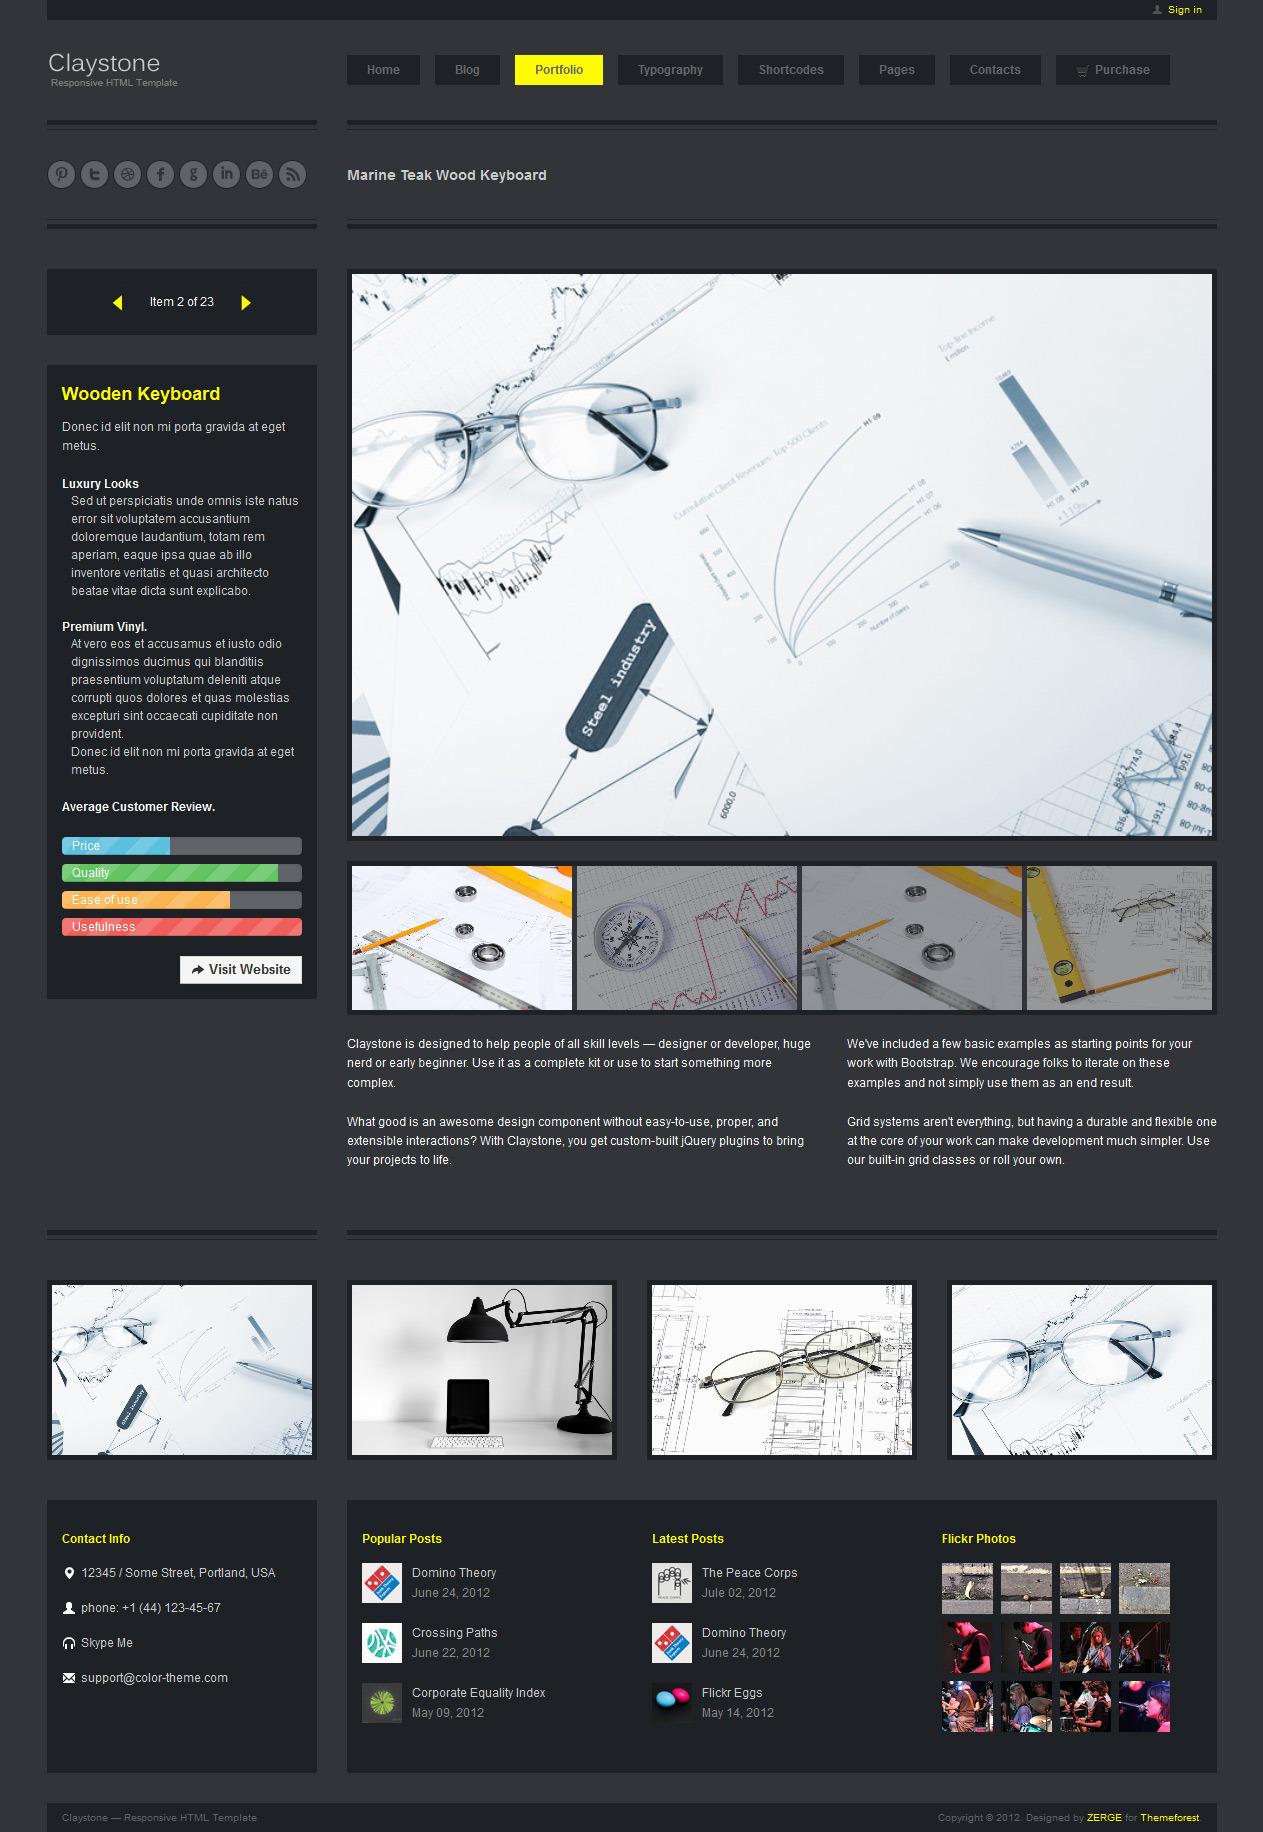 Claystone - Responsive HTML Template - 10 Portfolio Single Slideshow